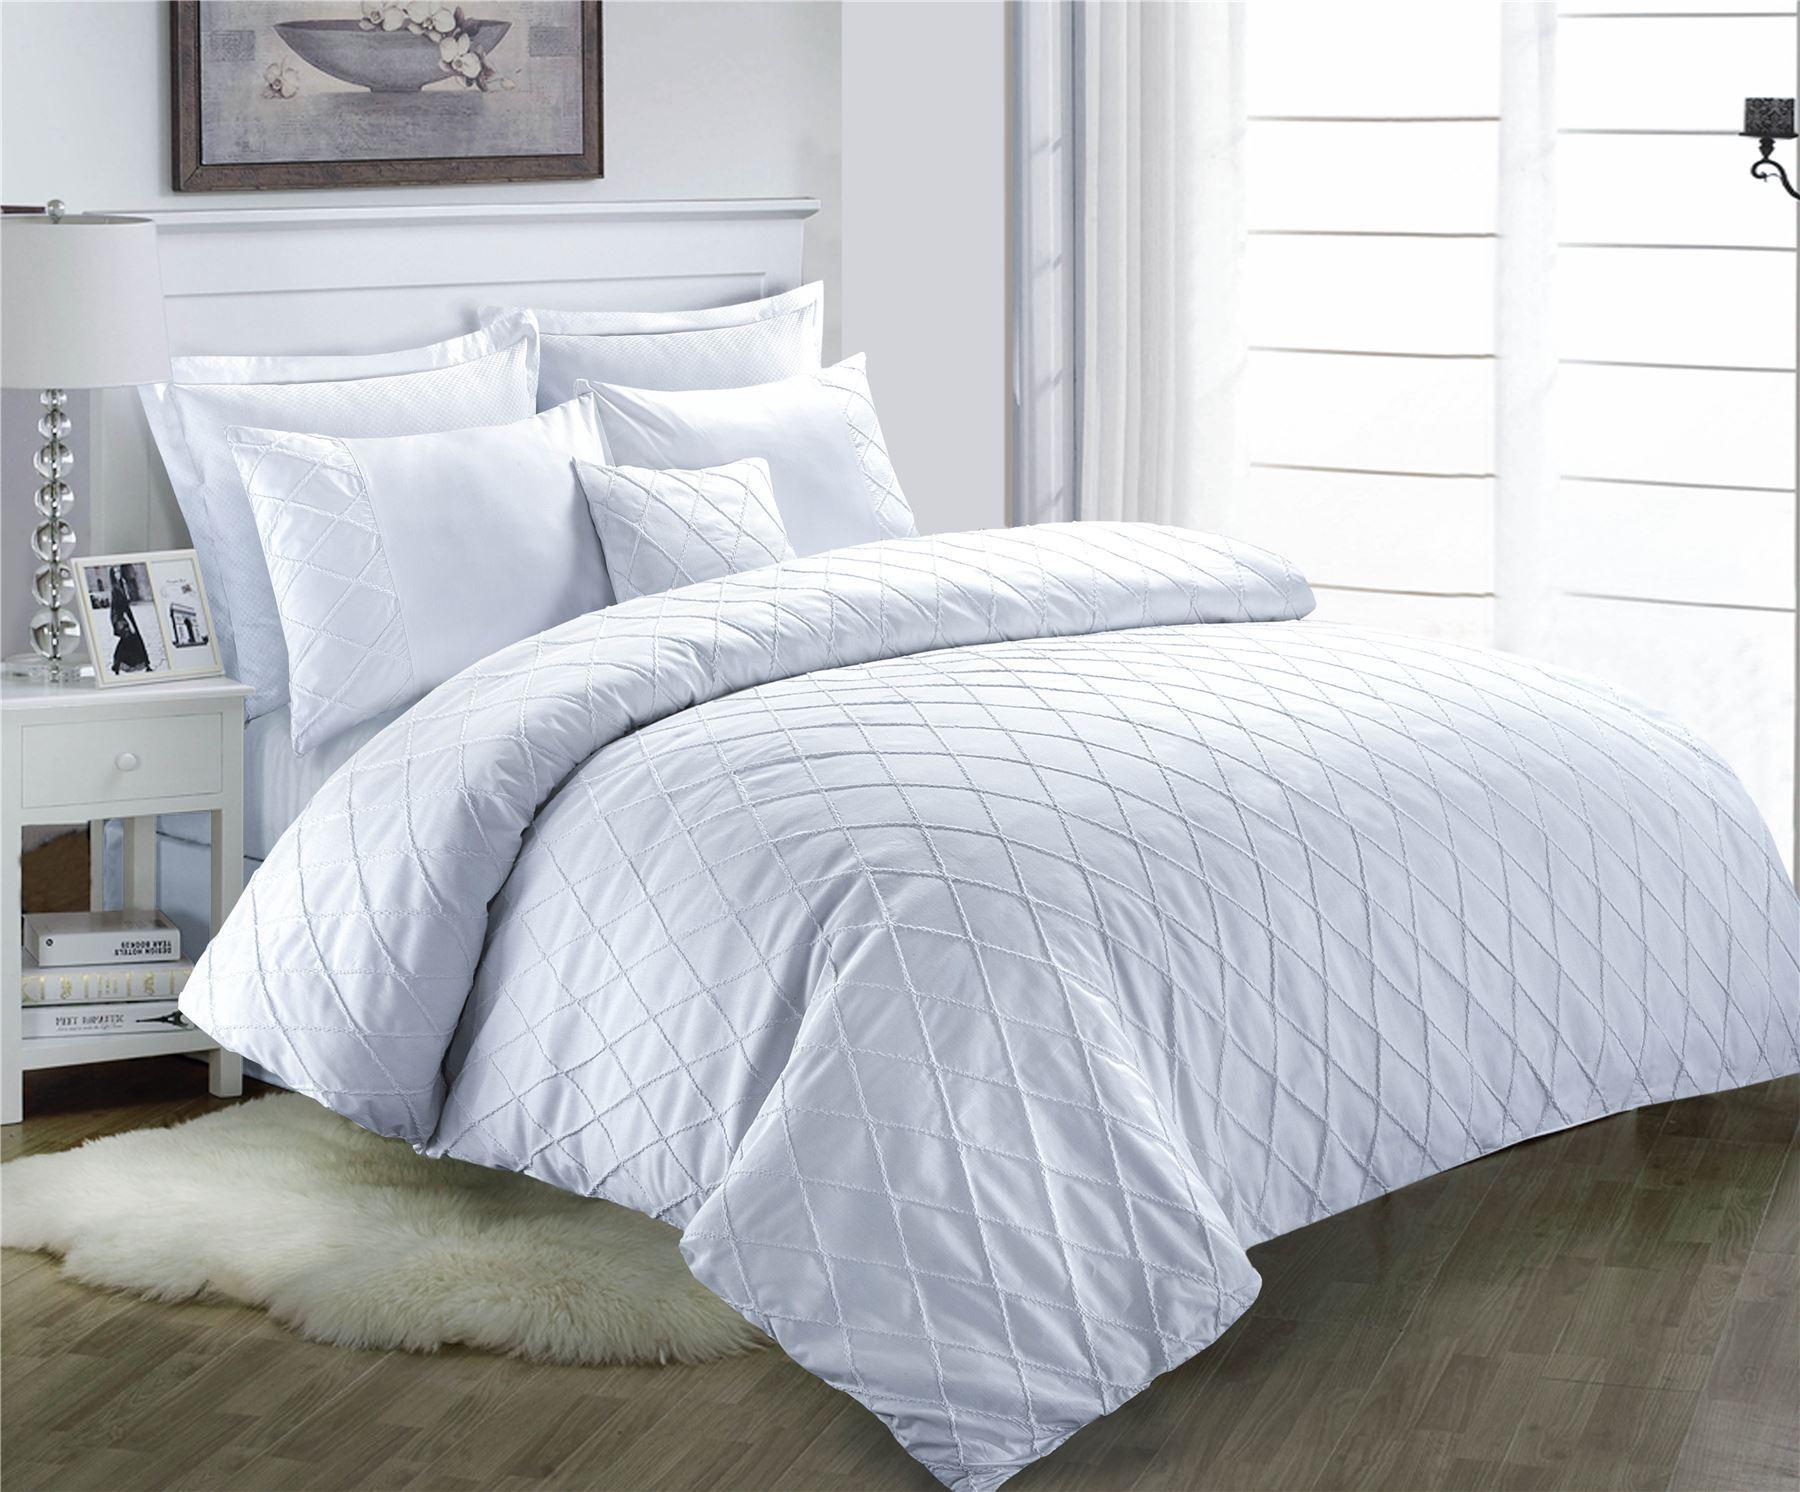 Decent JACOB Duvet Cover with Pillow Cases~POLYCOTTON Linen Bedding~UK SIZES NEW